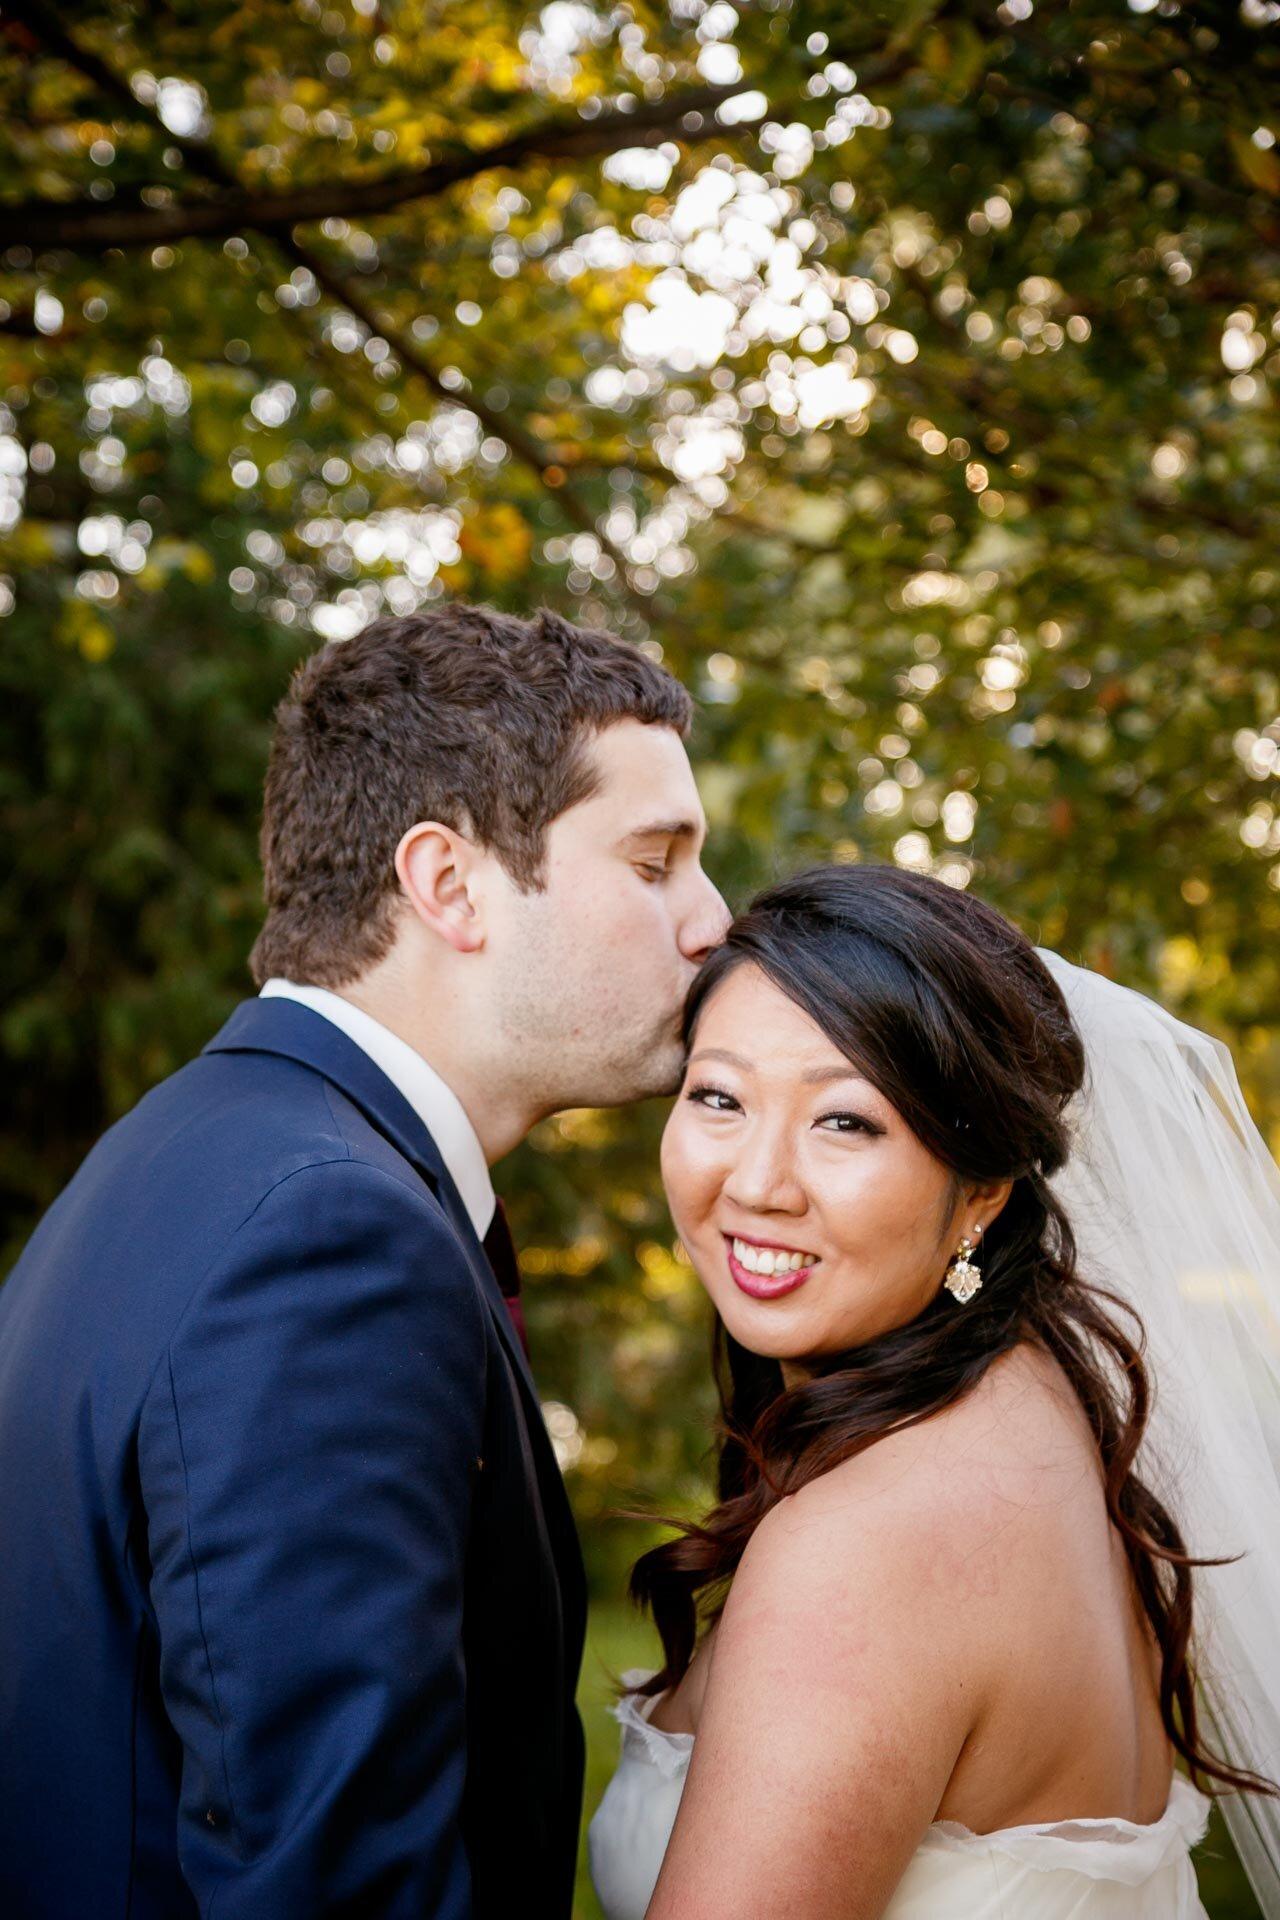 fall-lighting-adam-shea-photography-wedding-engagement-blog-adam-shea-photography-green-bay-appleton-neenah-photographer-16.jpg